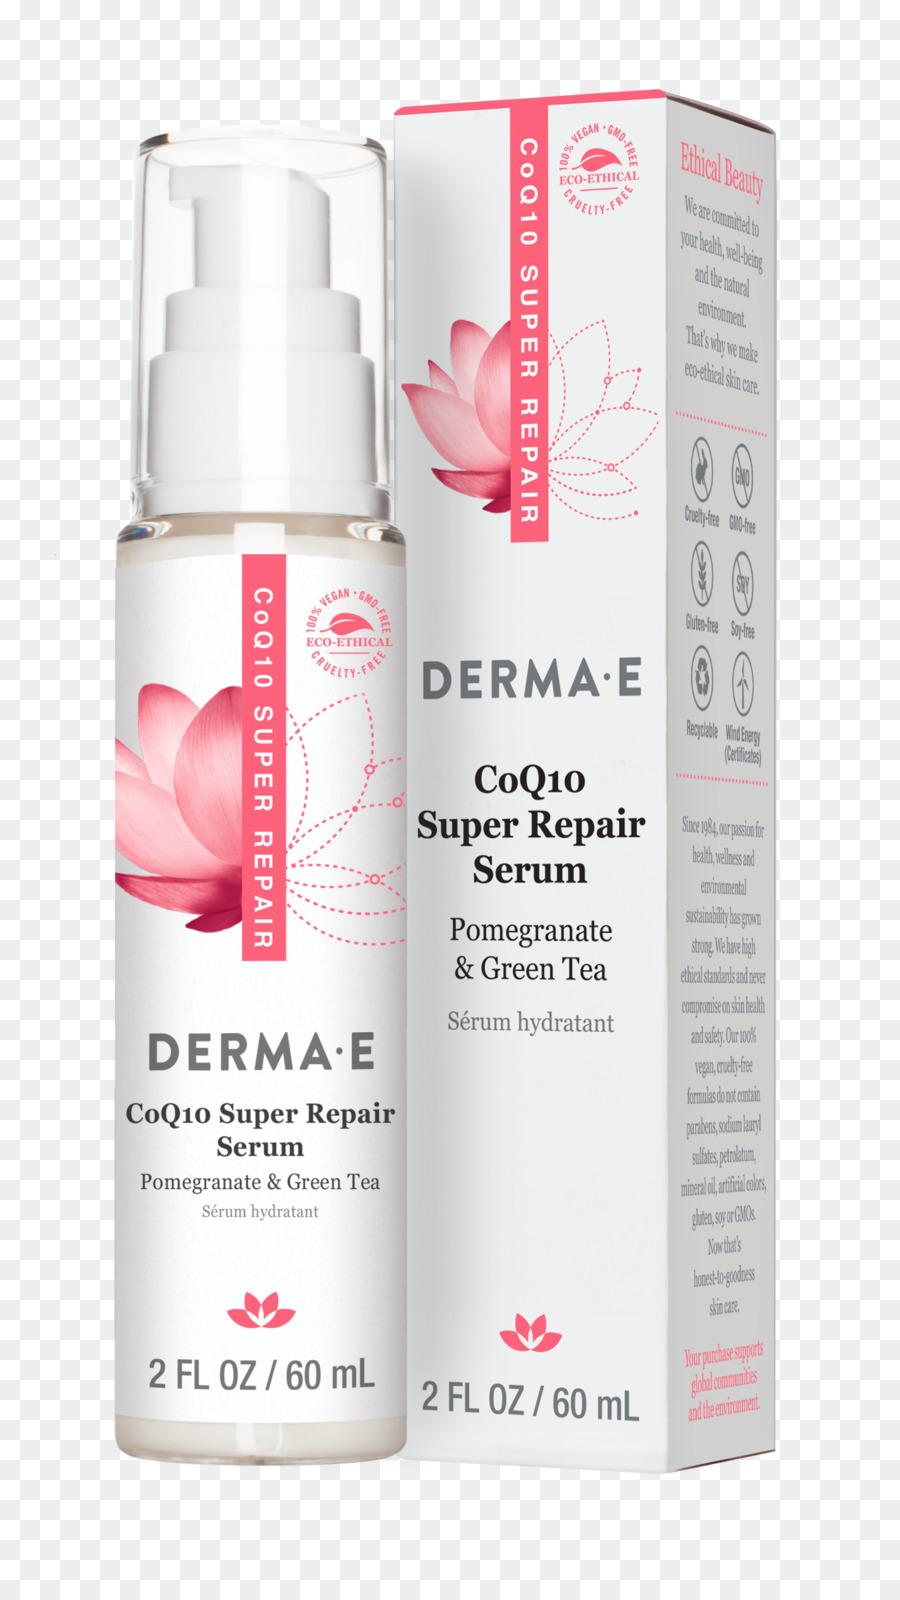 Serum Skin Care png download - 1712*3041 - Free Transparent